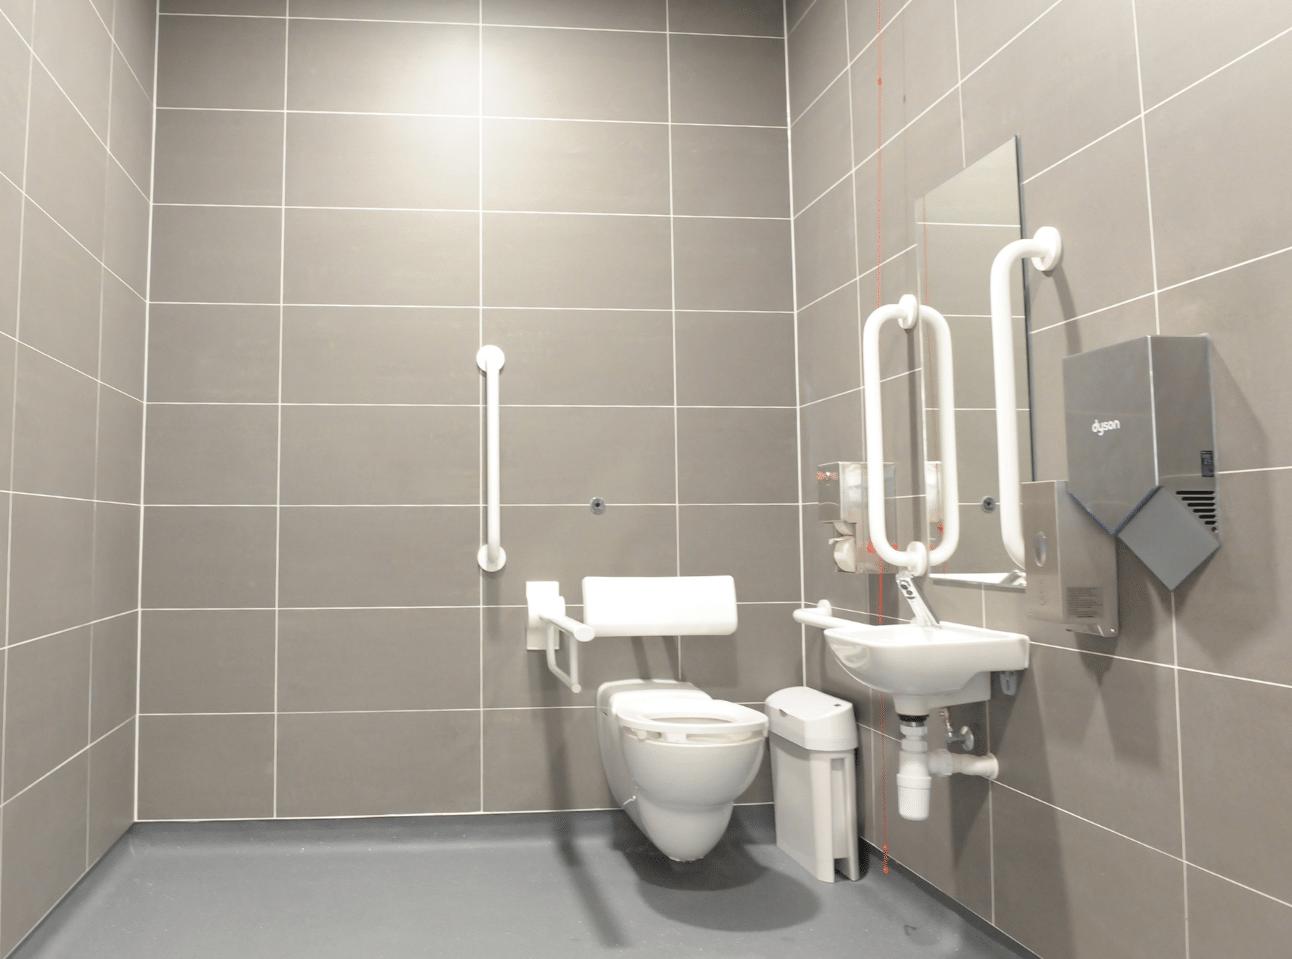 Disabled Washroom | National Physics Laboratory Case Study | Commercial Washrooms